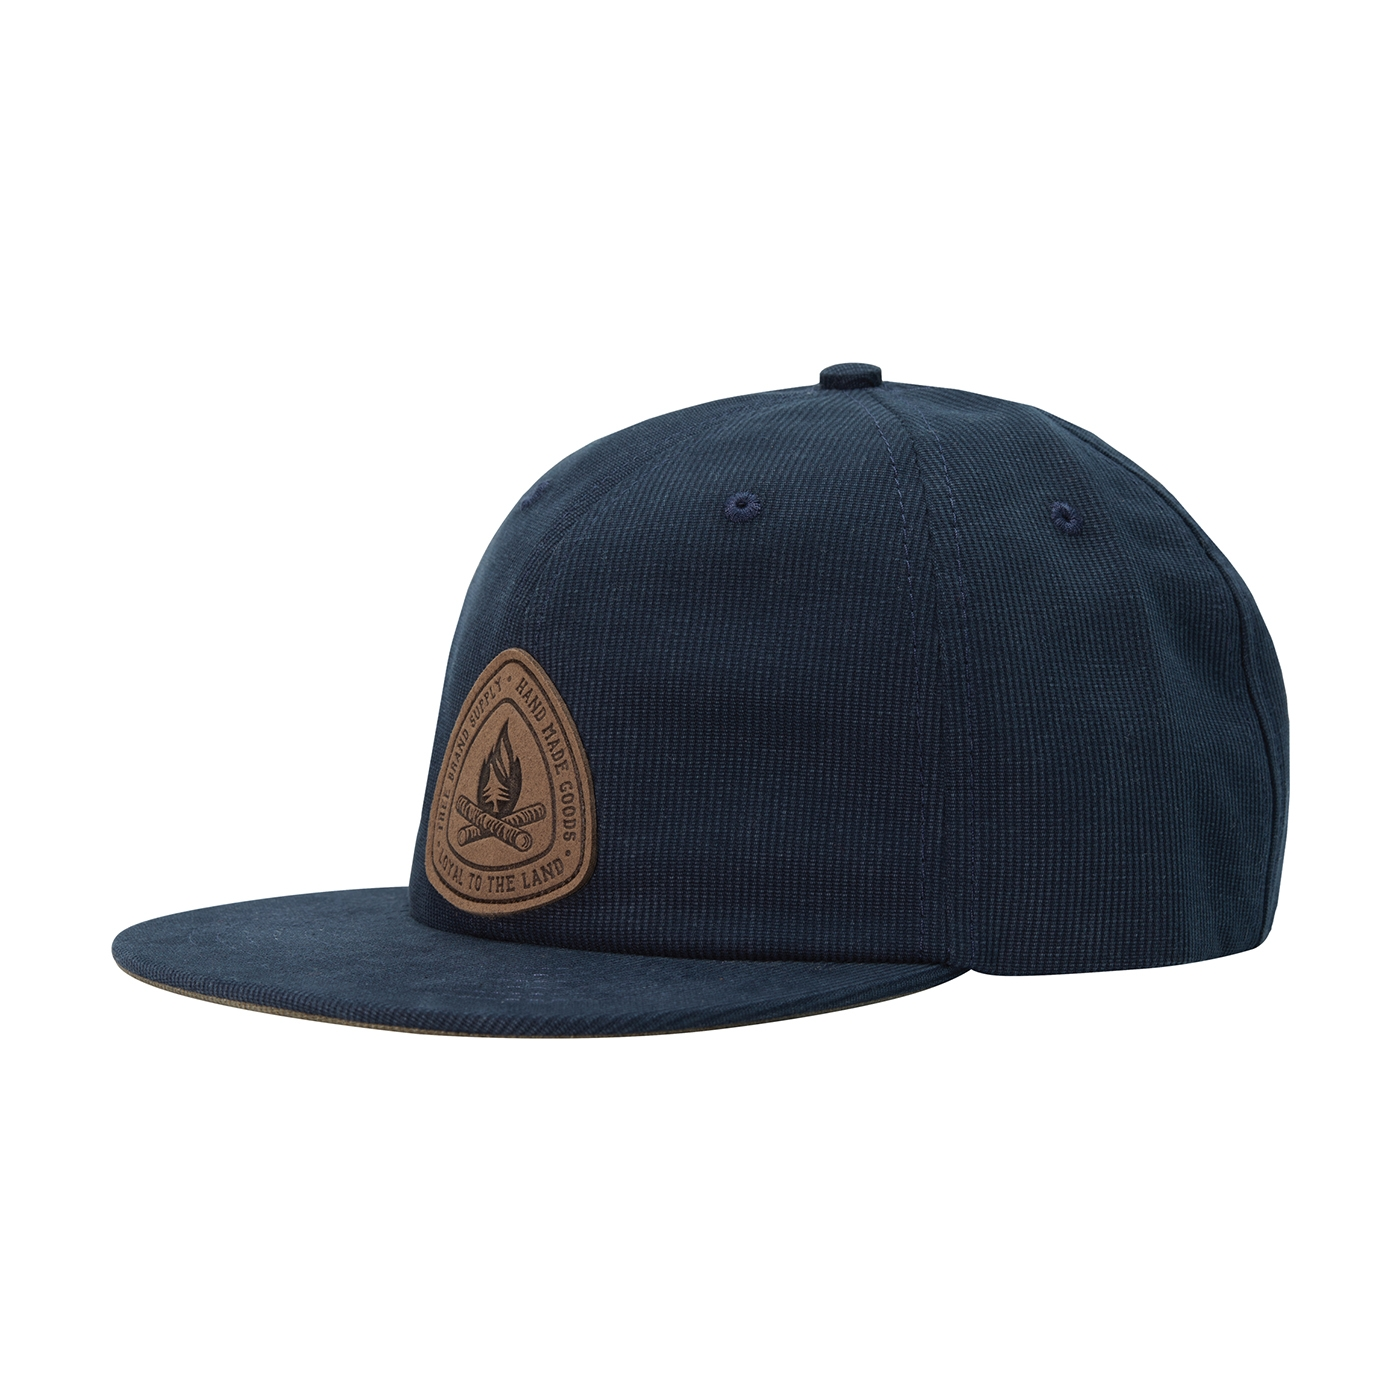 a54138a6fec Station Hat  Station Hat  Station Hat ...